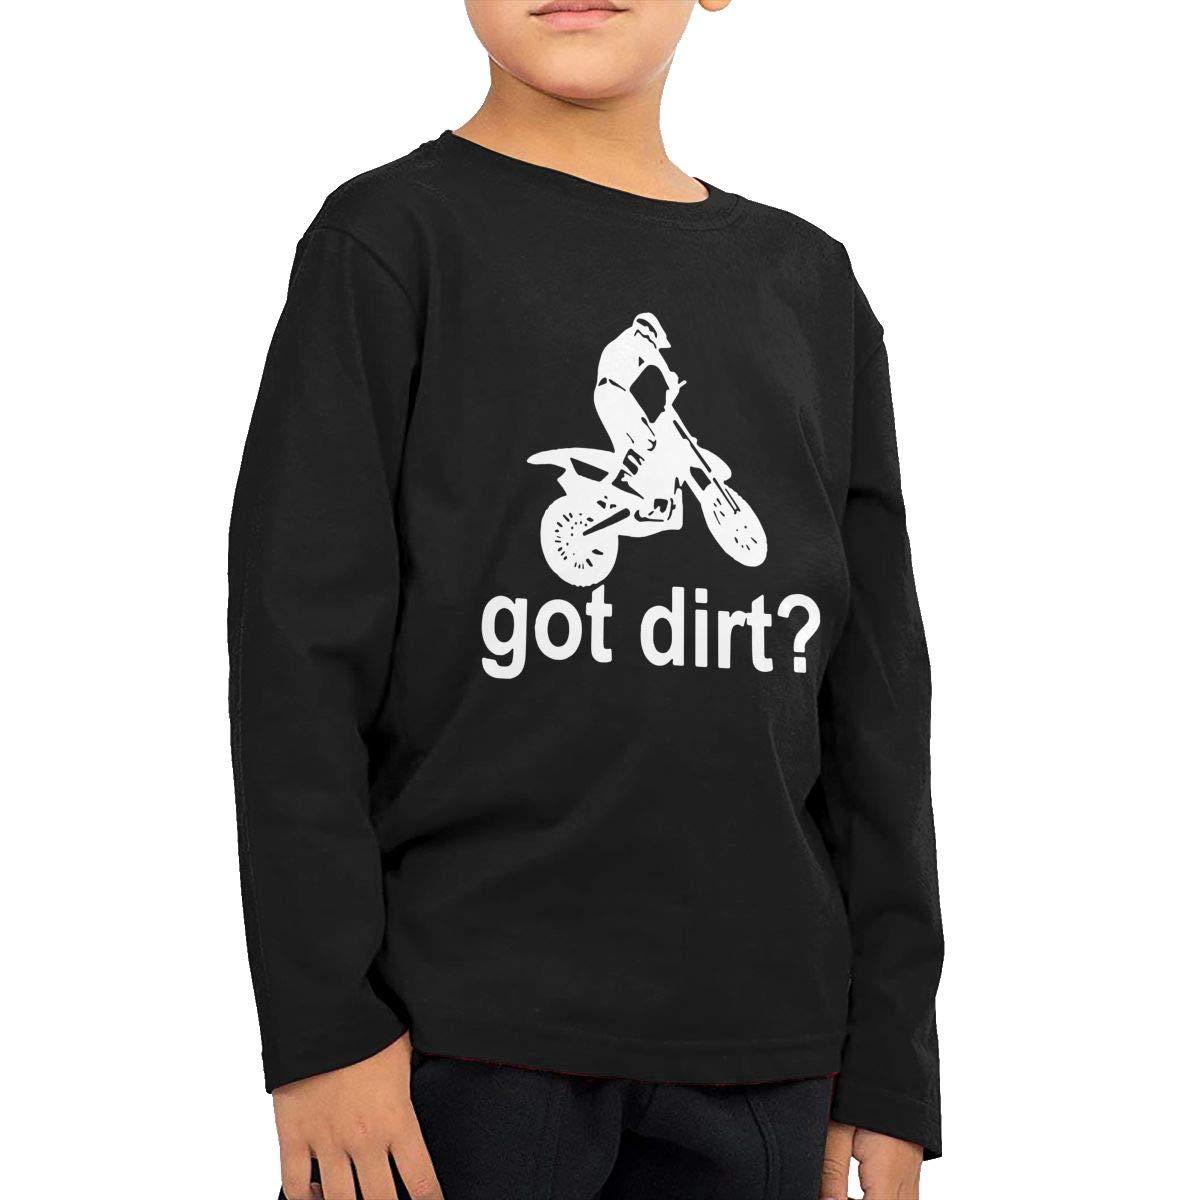 Fryhyu8 Toddler Childrens Got Dirt Bike Motocross Racing Printed Long Sleeve 100/% Cotton Infants T-Shirts